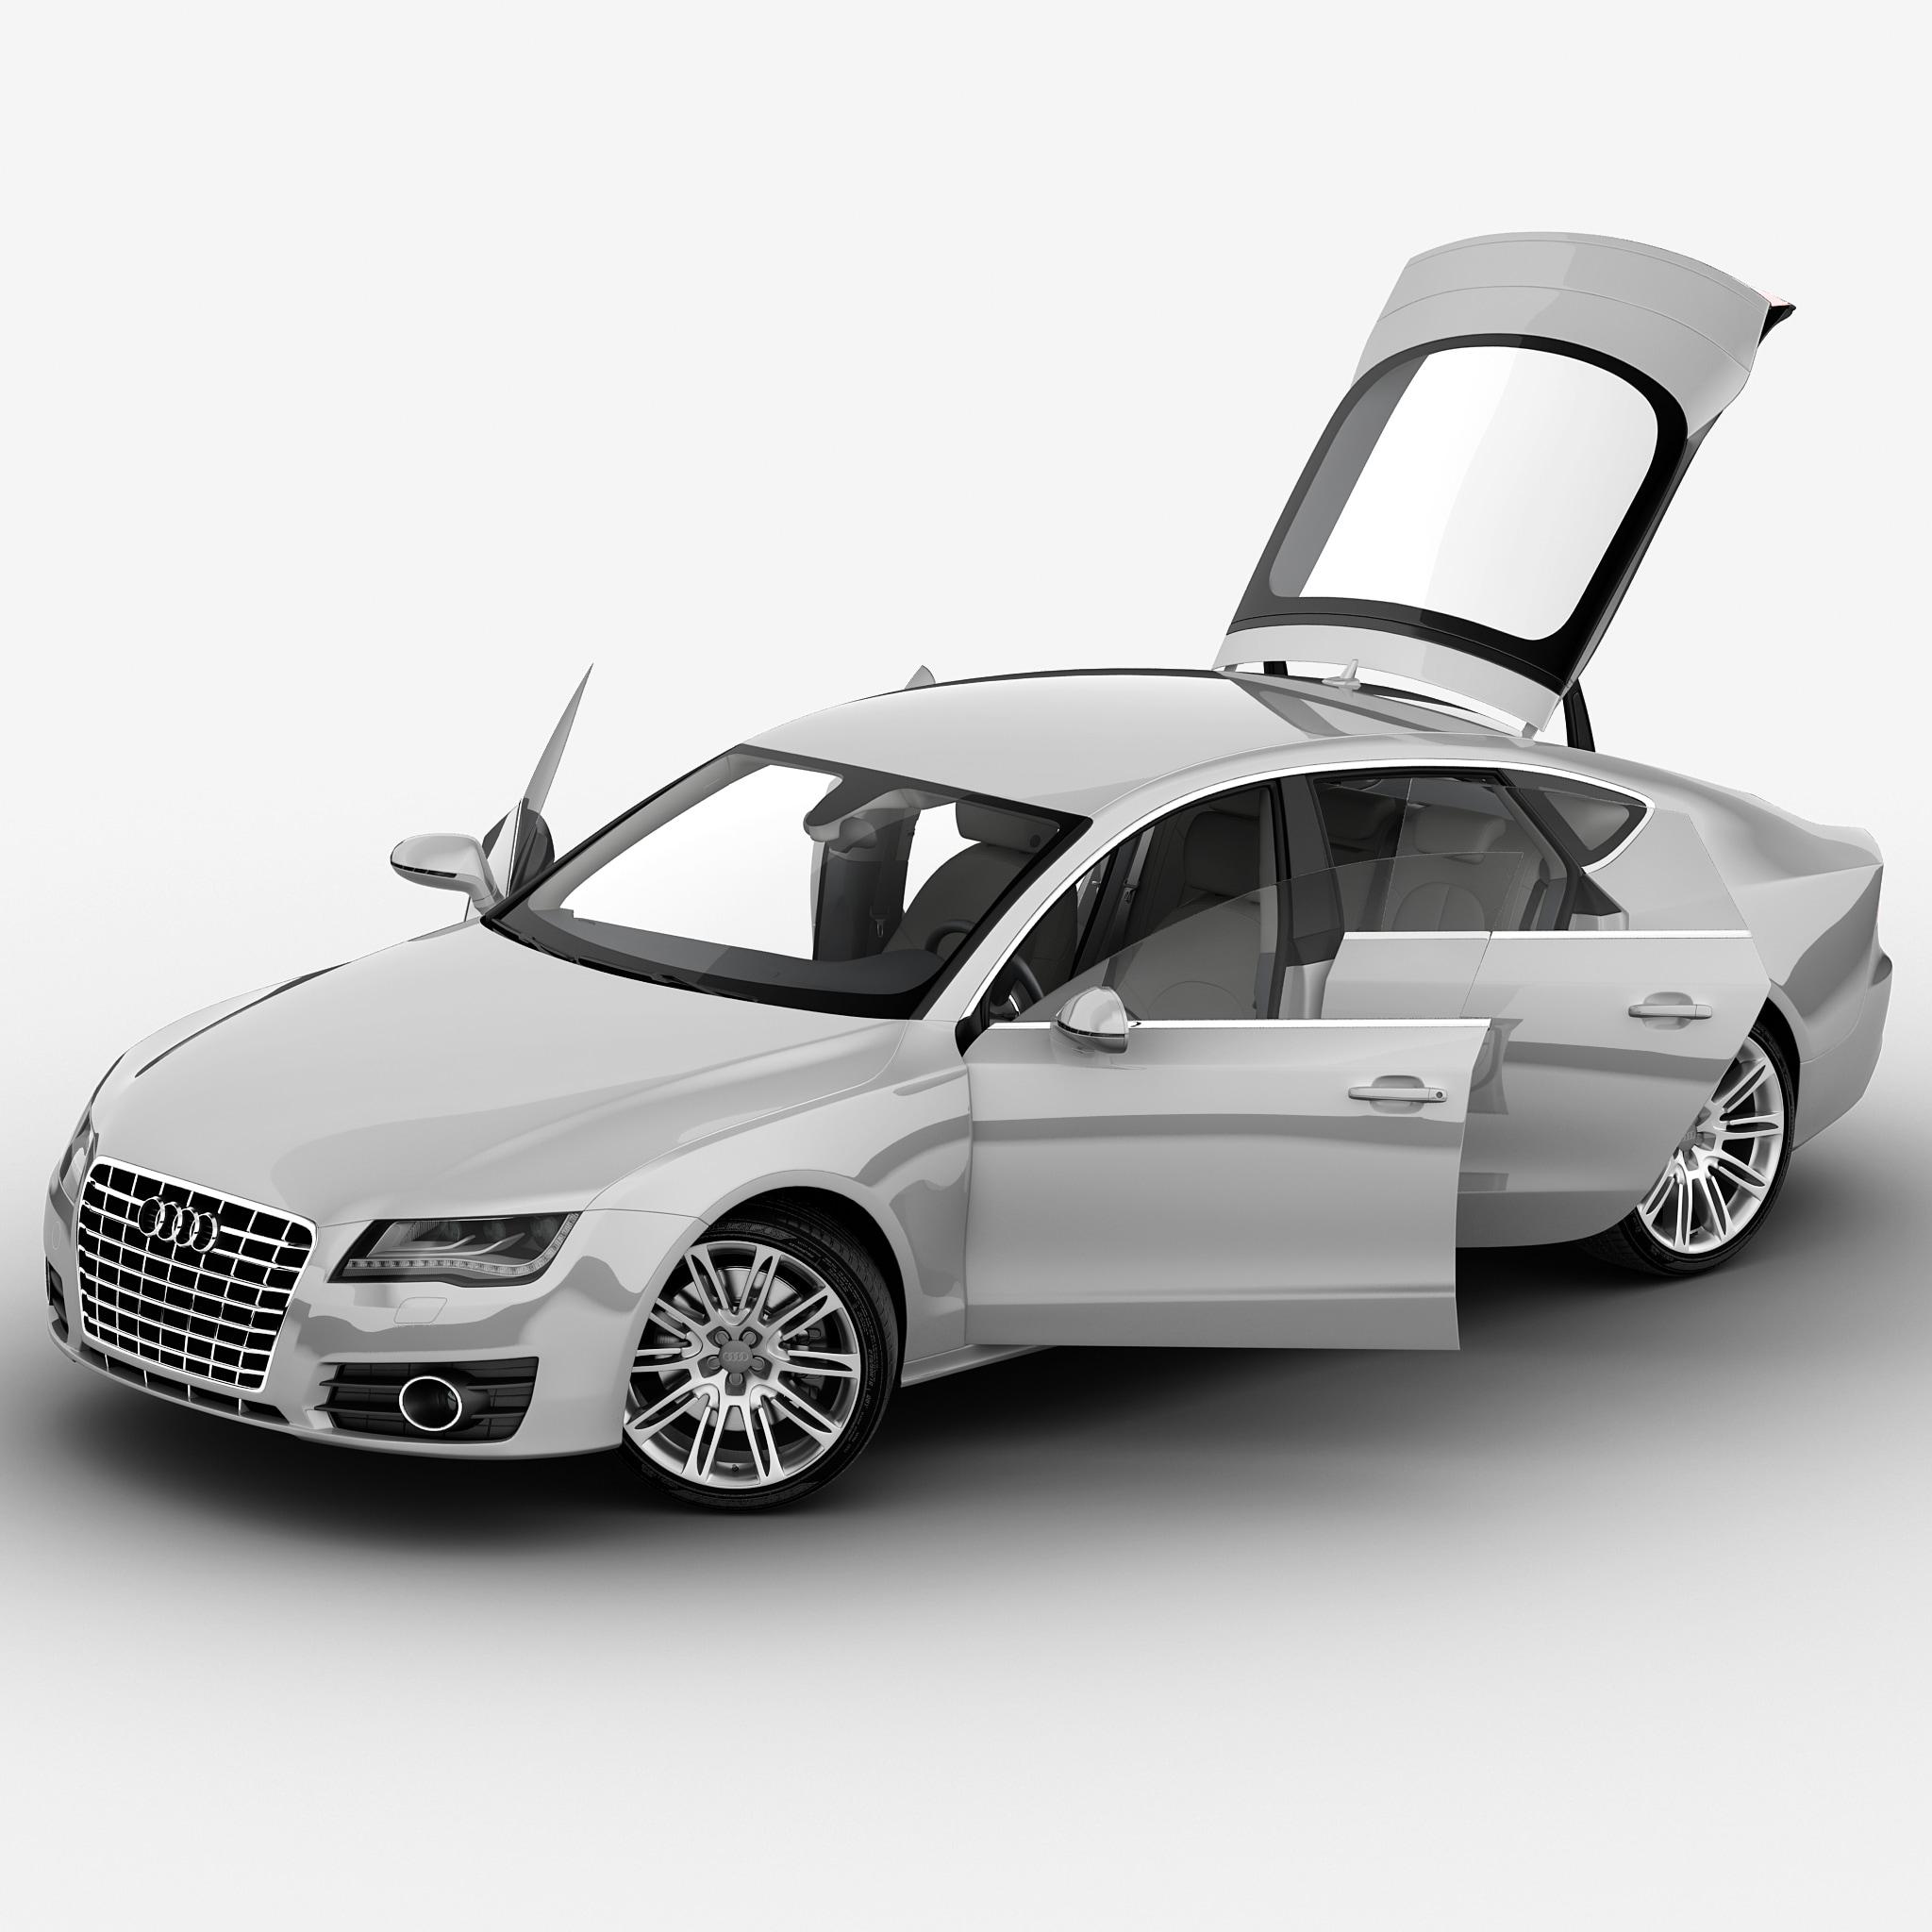 Audi A7 2013 Rigged_2.jpg